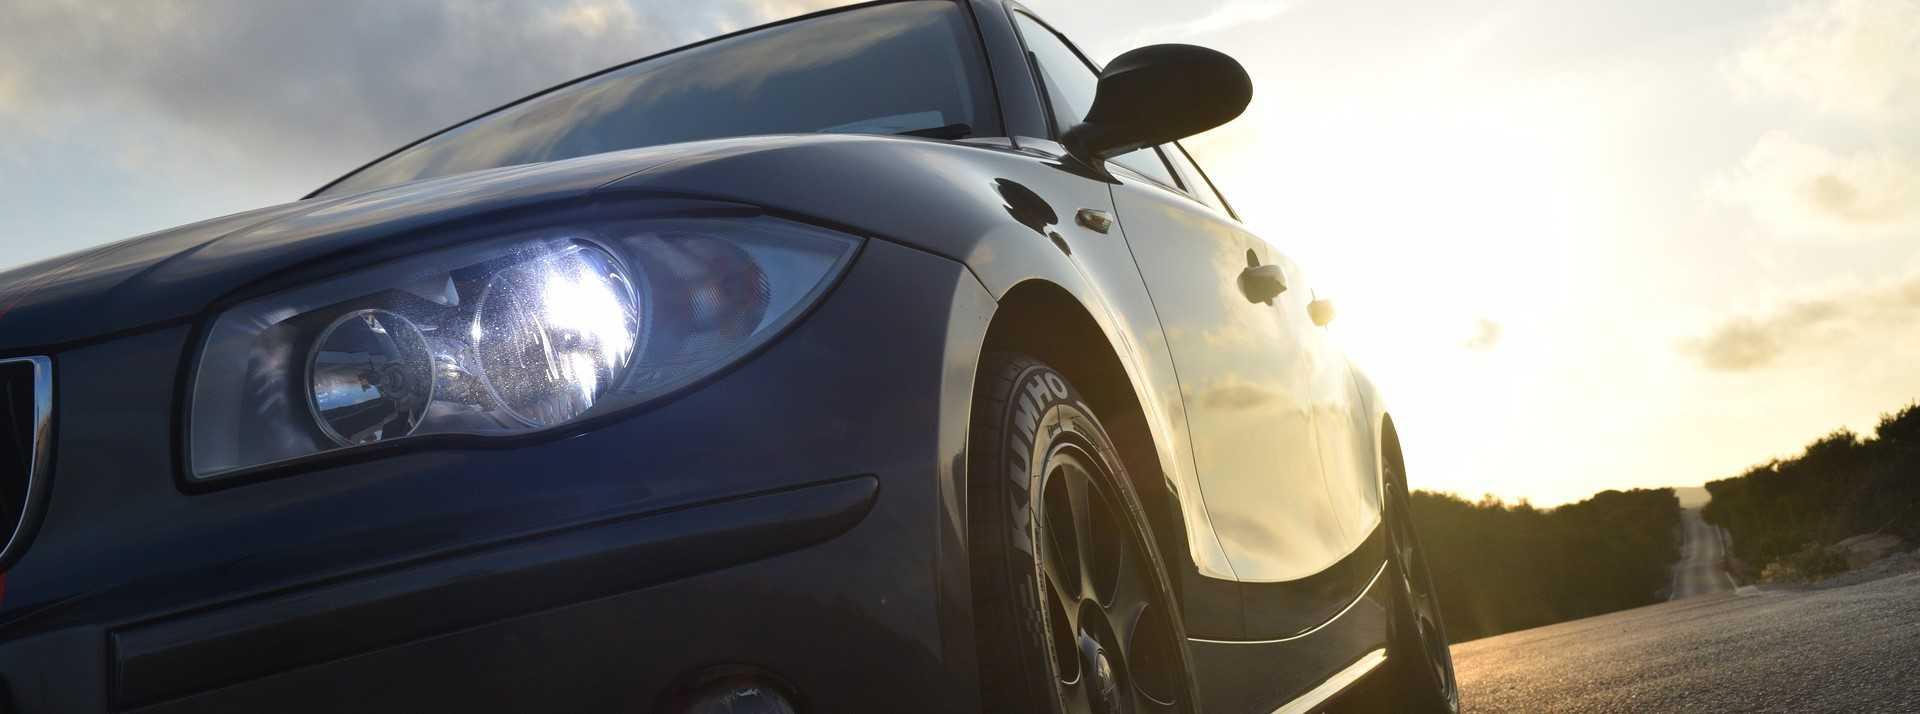 BMW Car in Corpus Christi, Texas | Kids Car Donations